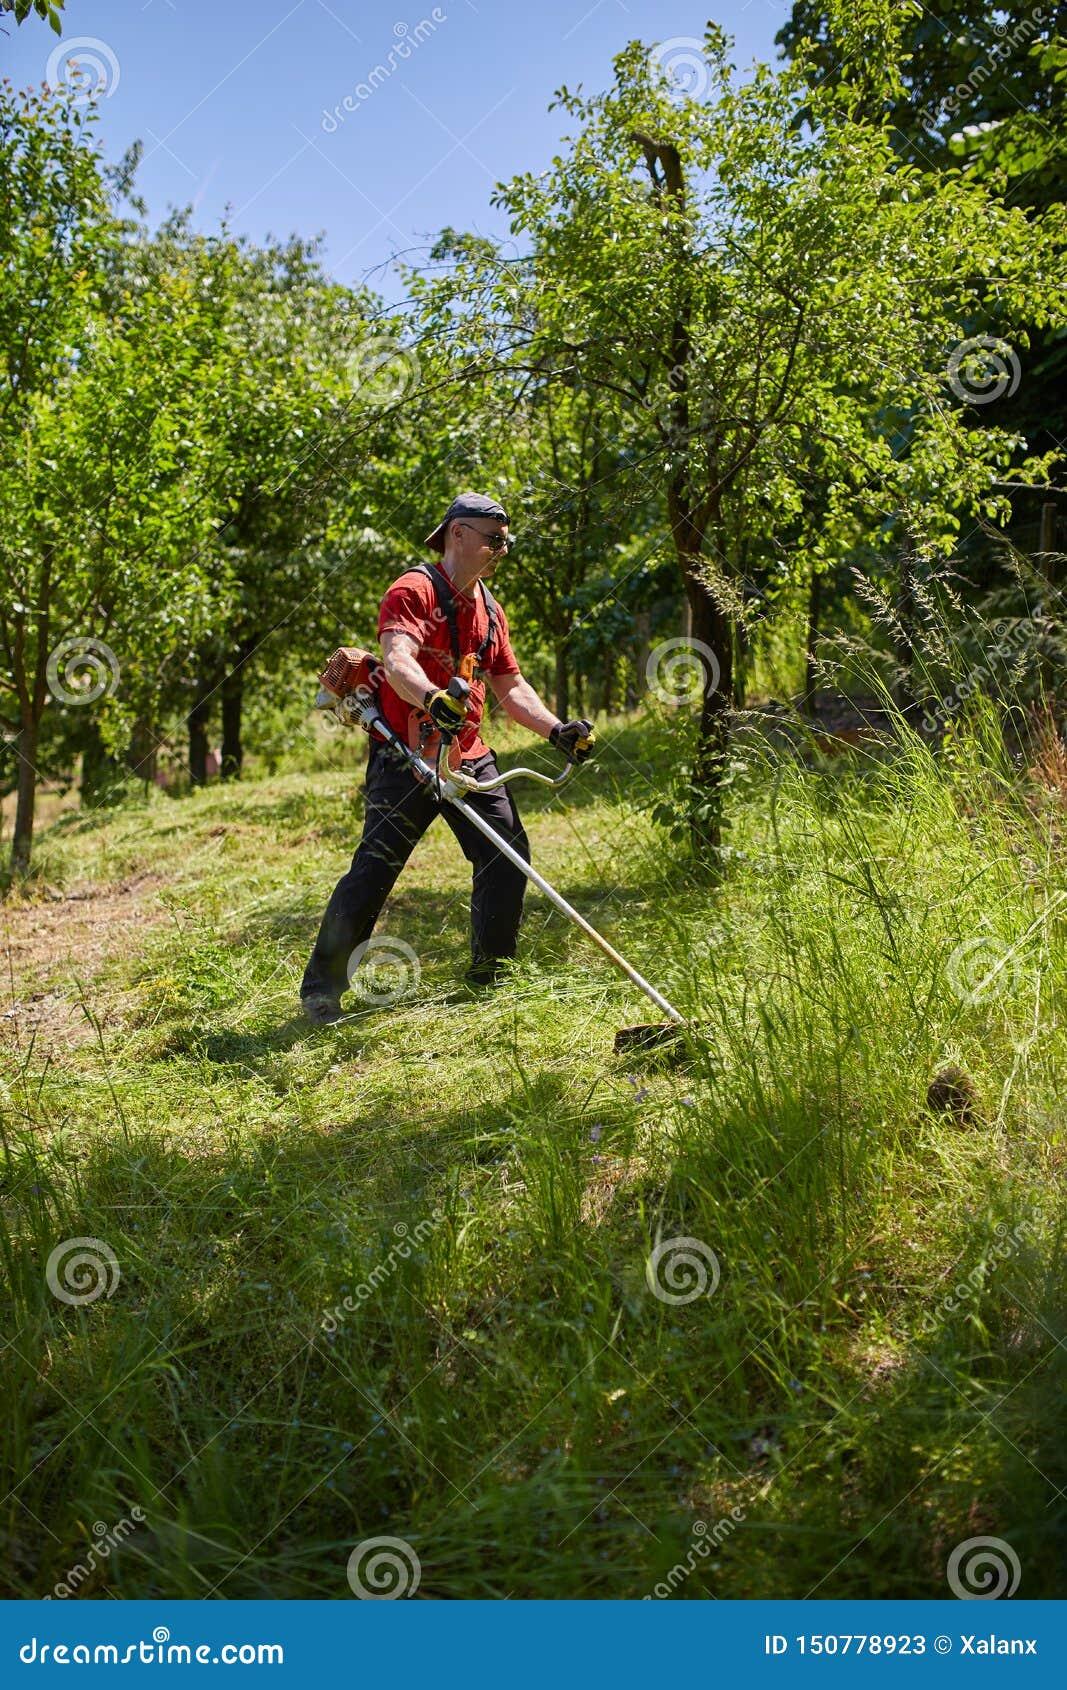 Man Mowing, Cutting Grass On His Huge Garden Yard, Green